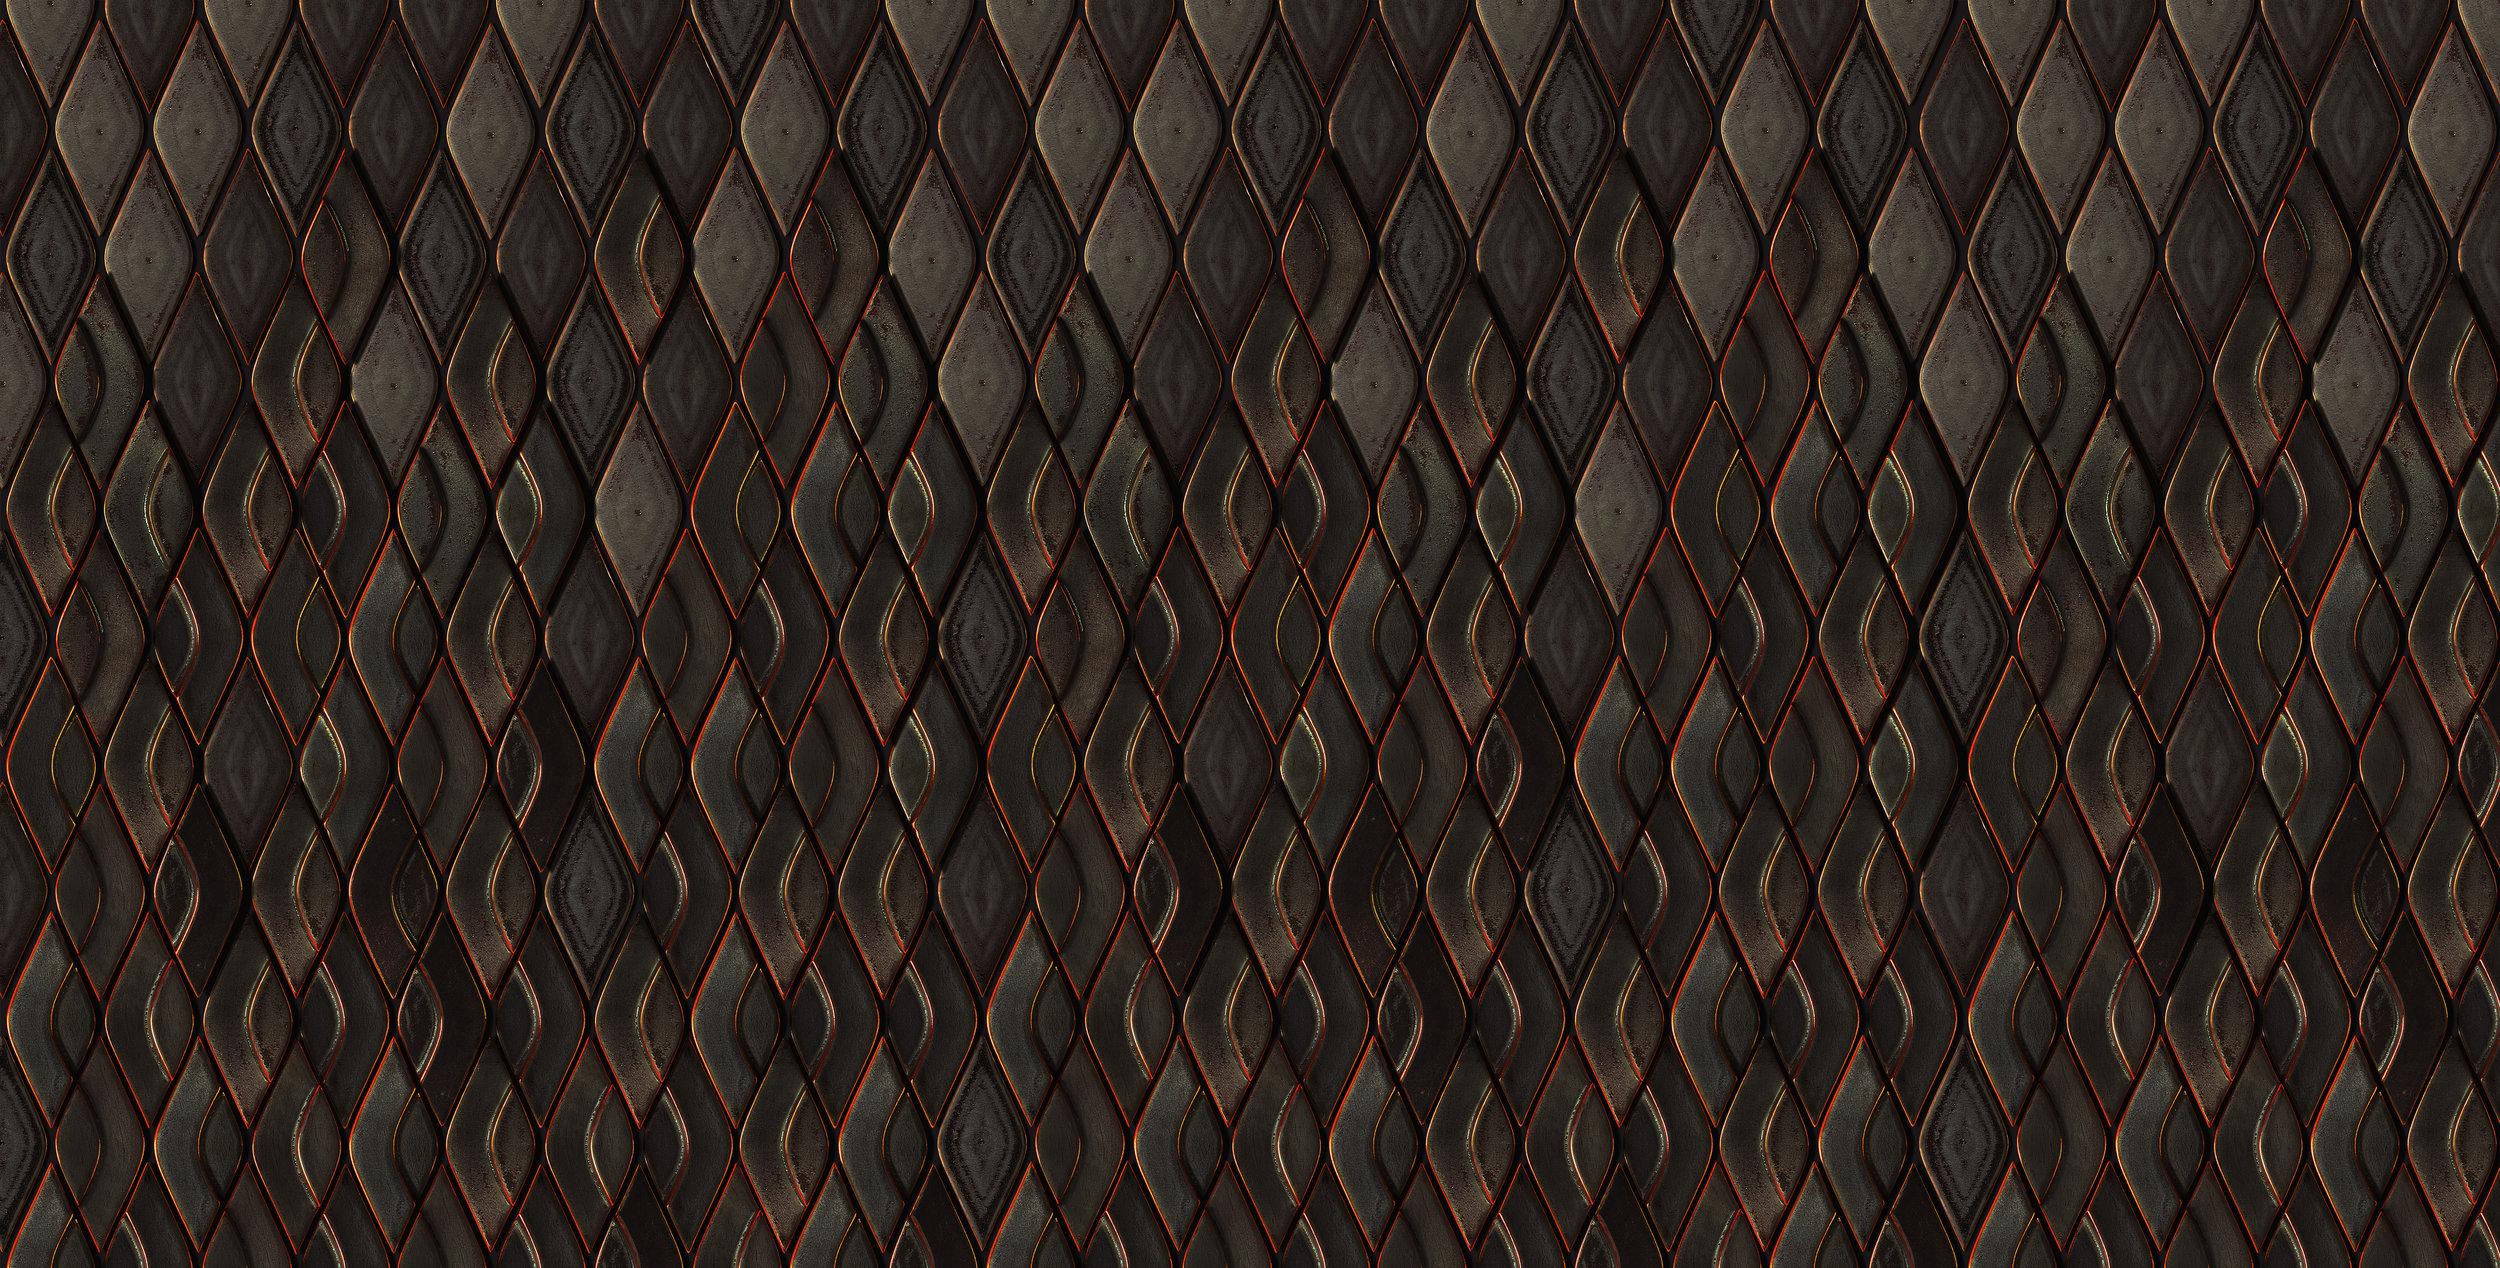 CM31-32-33 : Random pattern